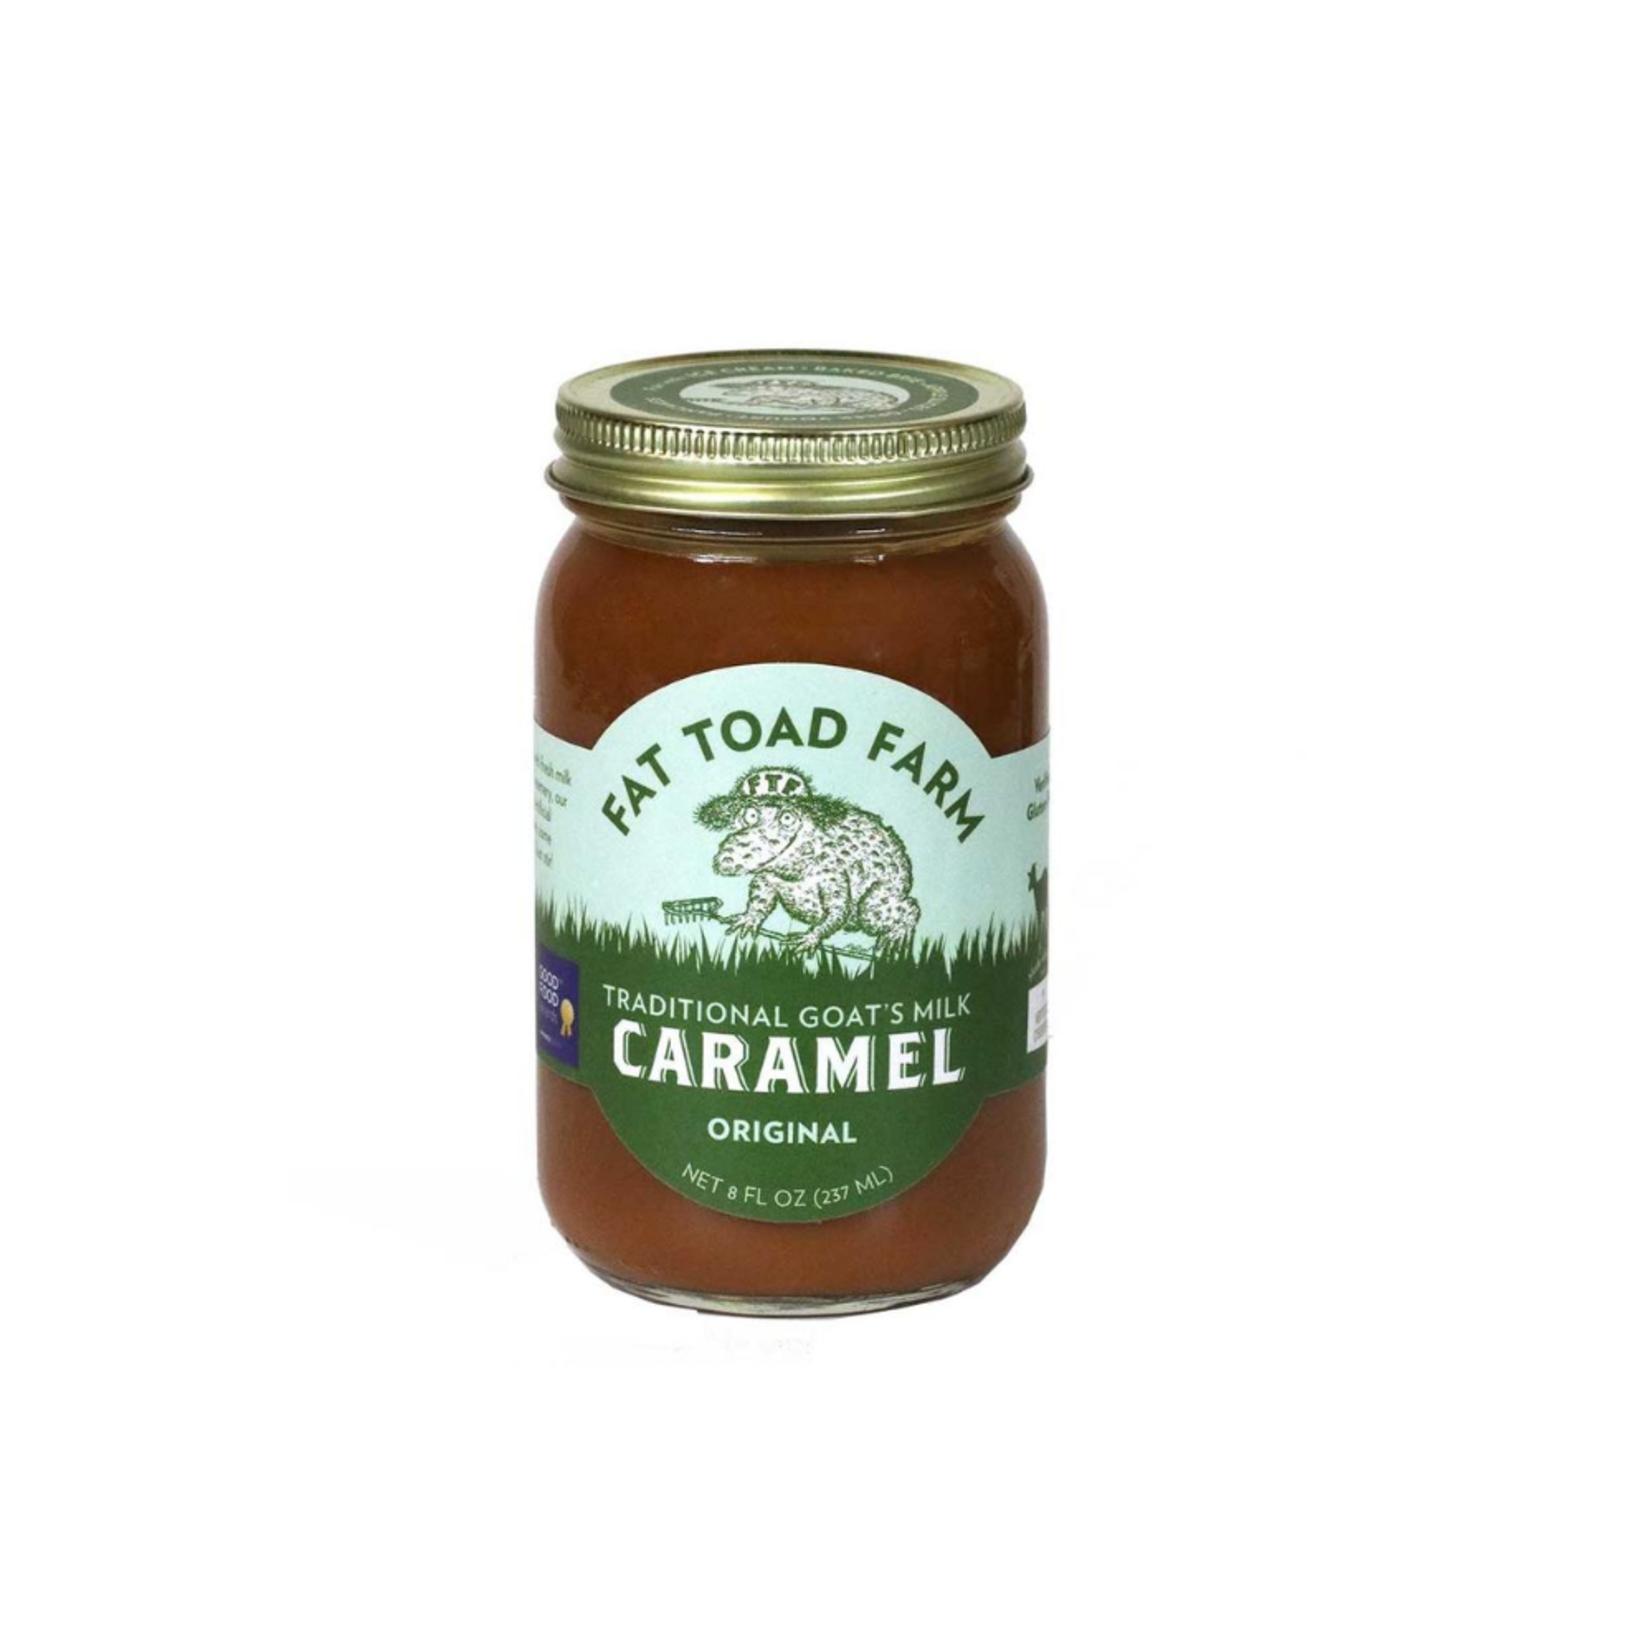 8oz Original Goat's Milk Caramel